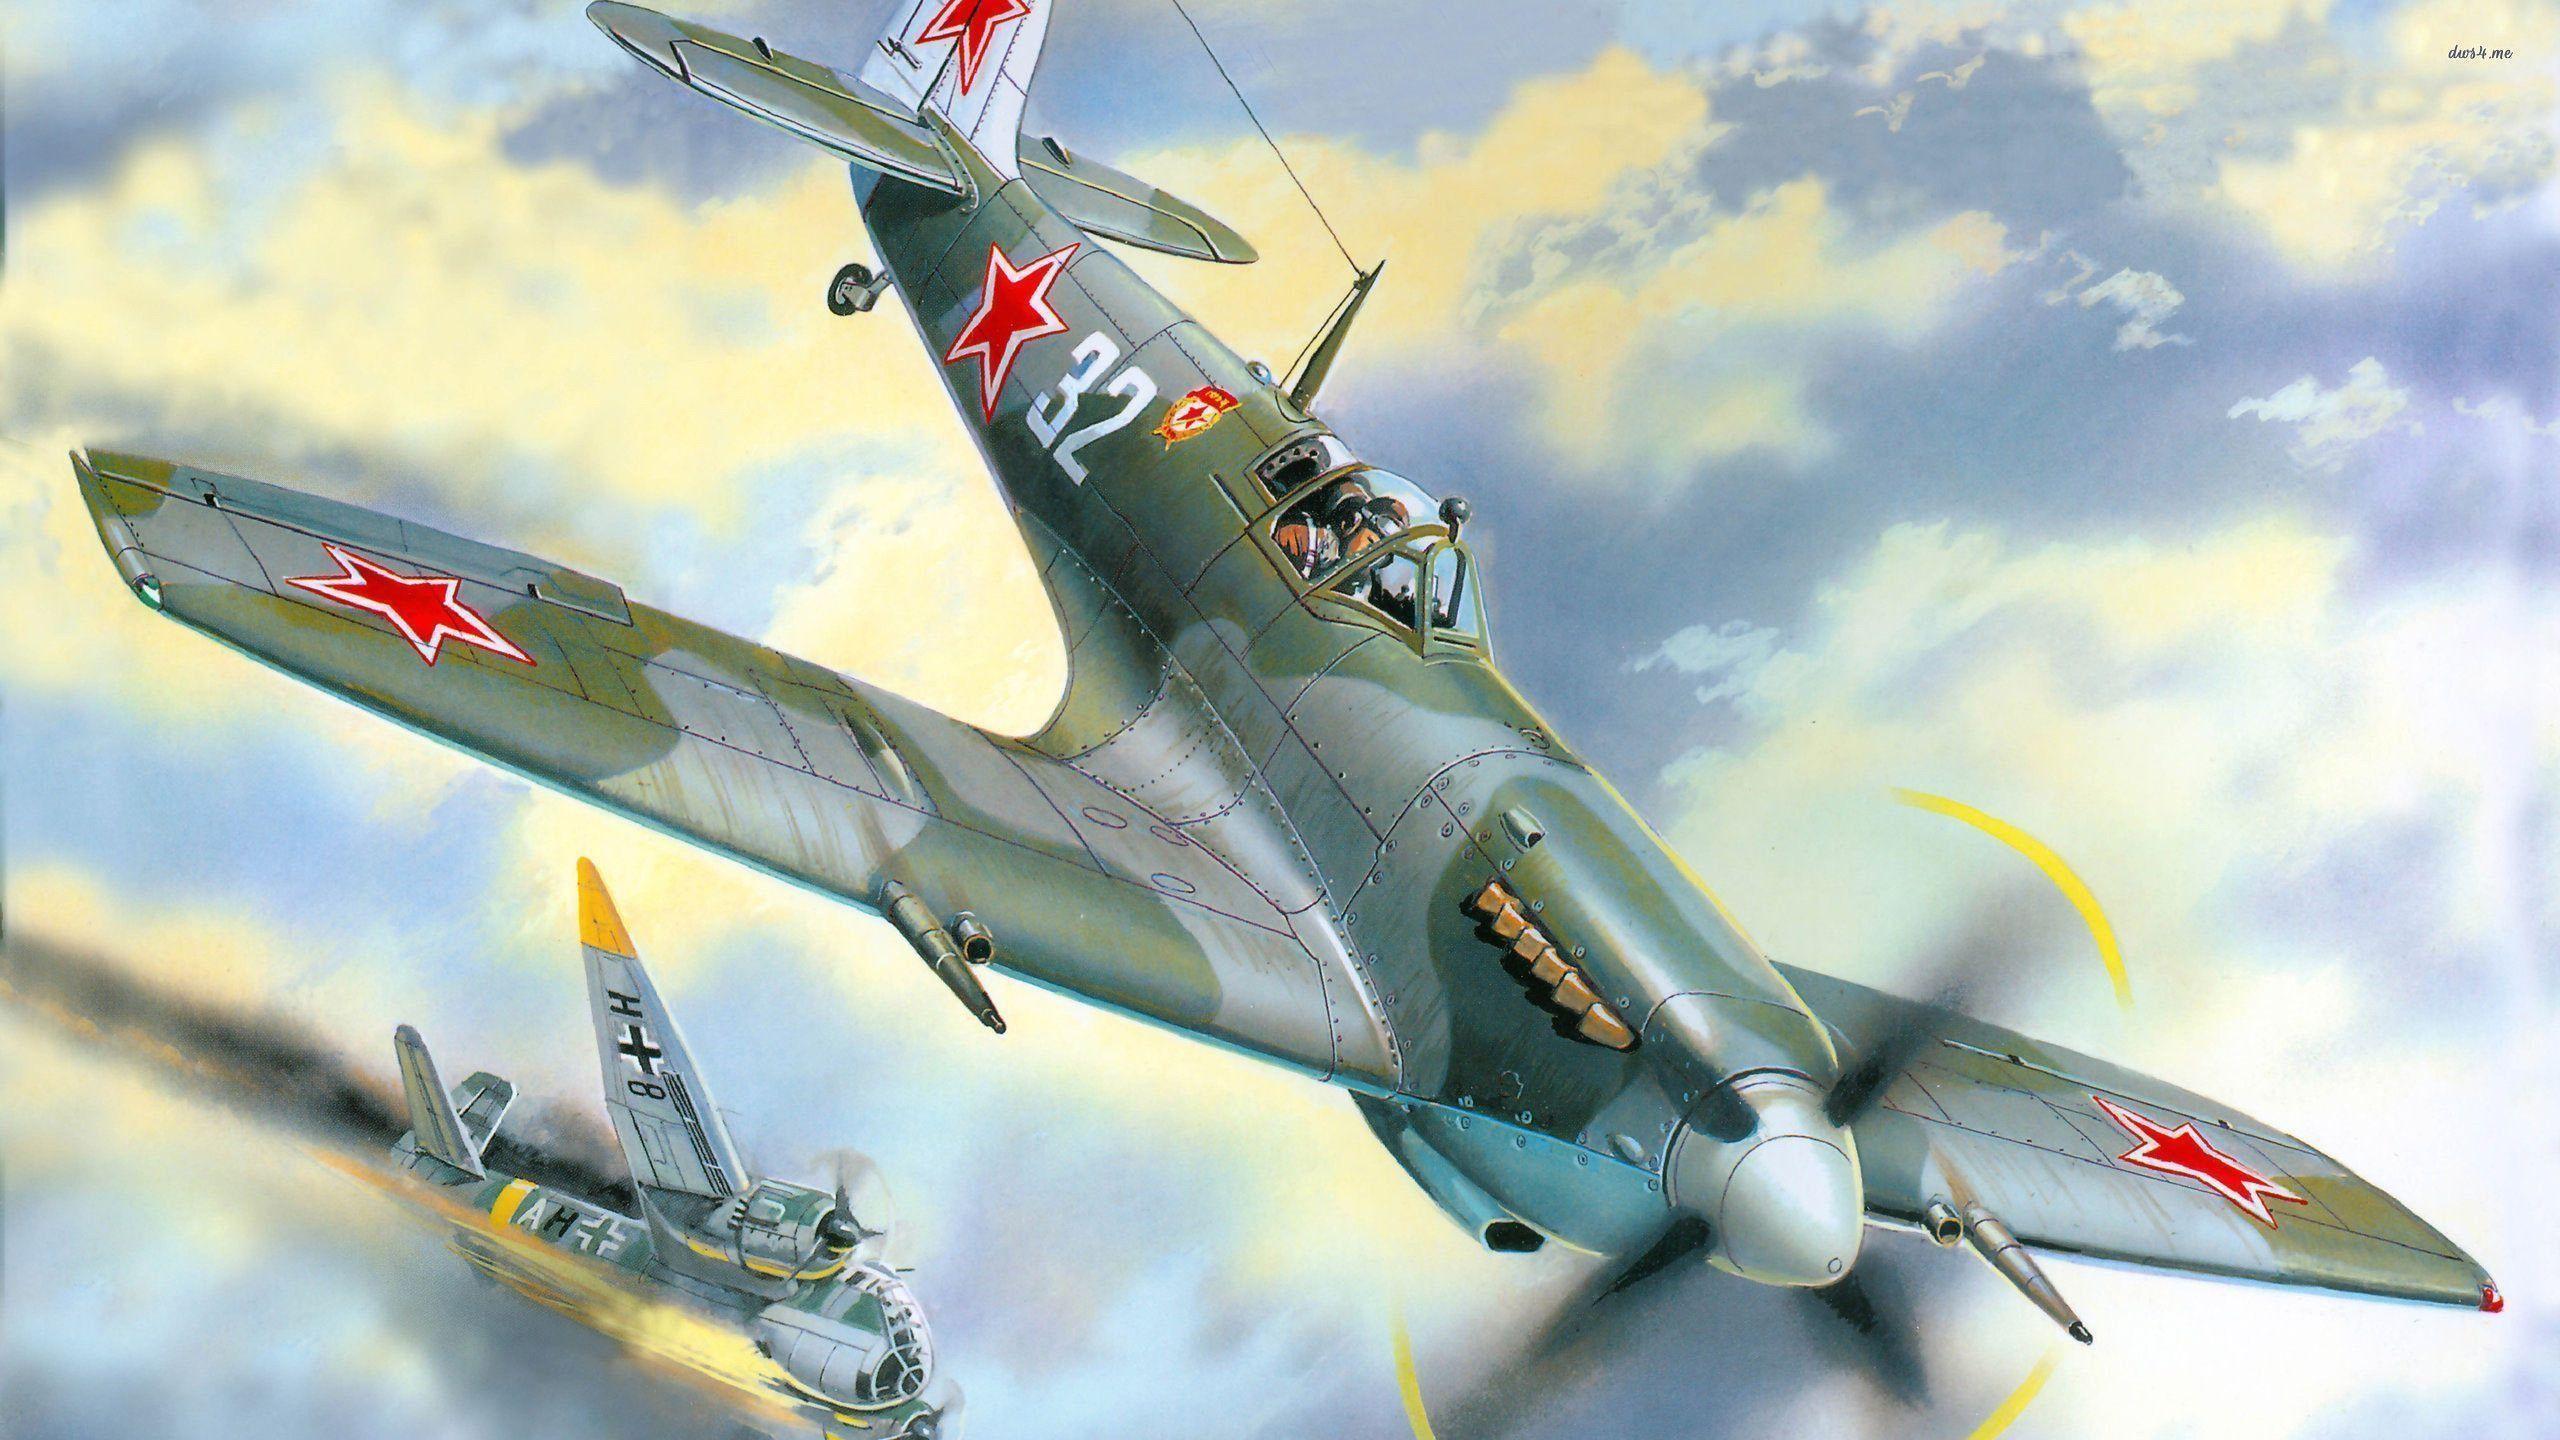 Military - Supermarine Spitfire Wallpaper